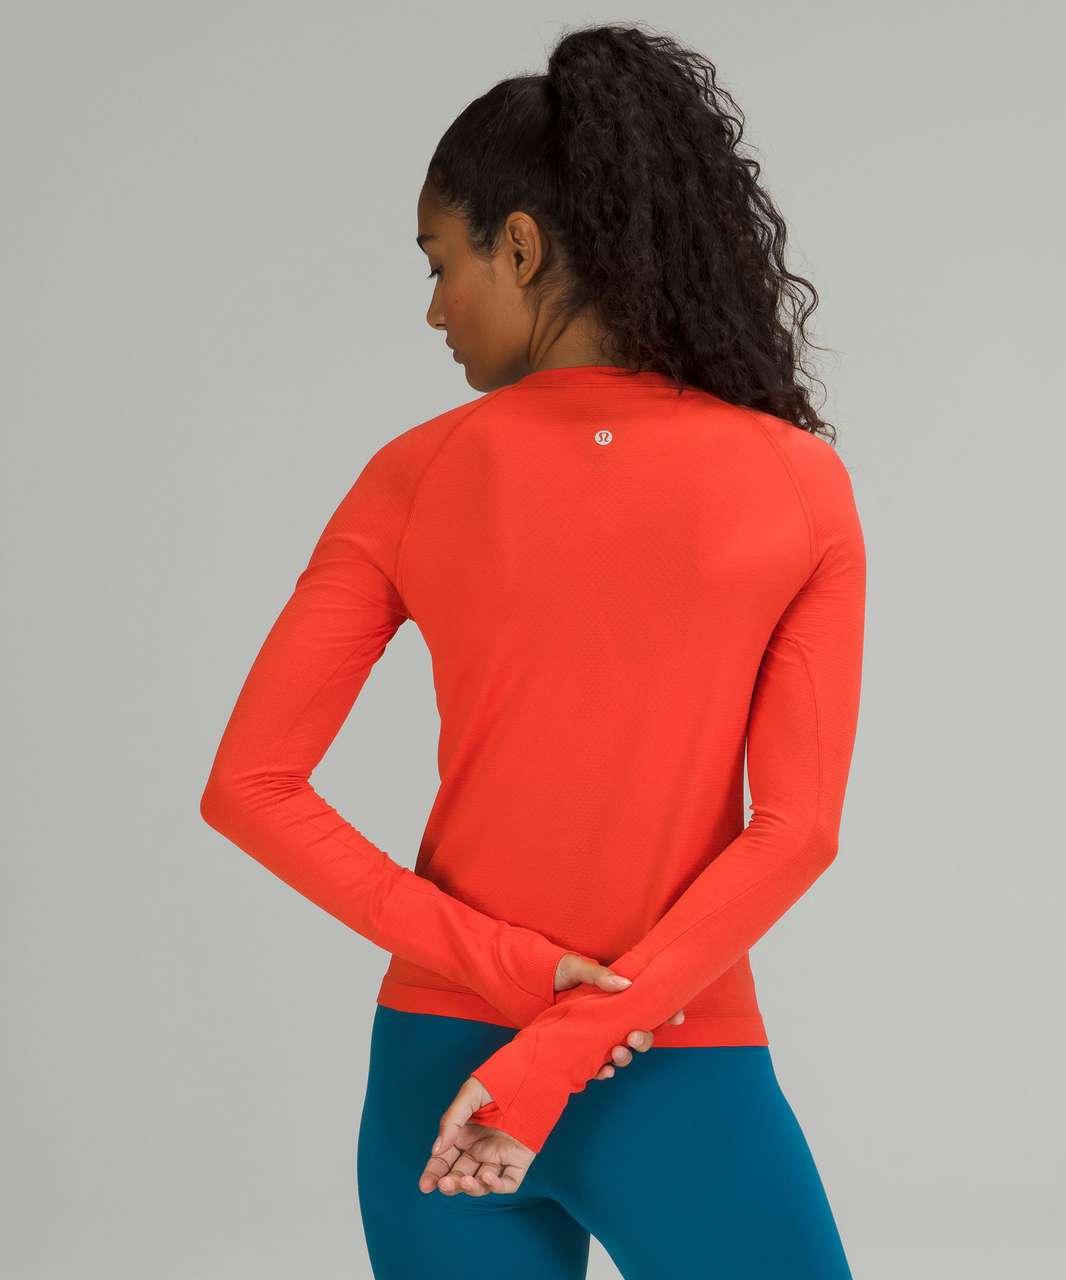 Lululemon Swiftly Tech Long Sleeve Shirt 2.0 *Race Length - Autumn Red / Autumn Red